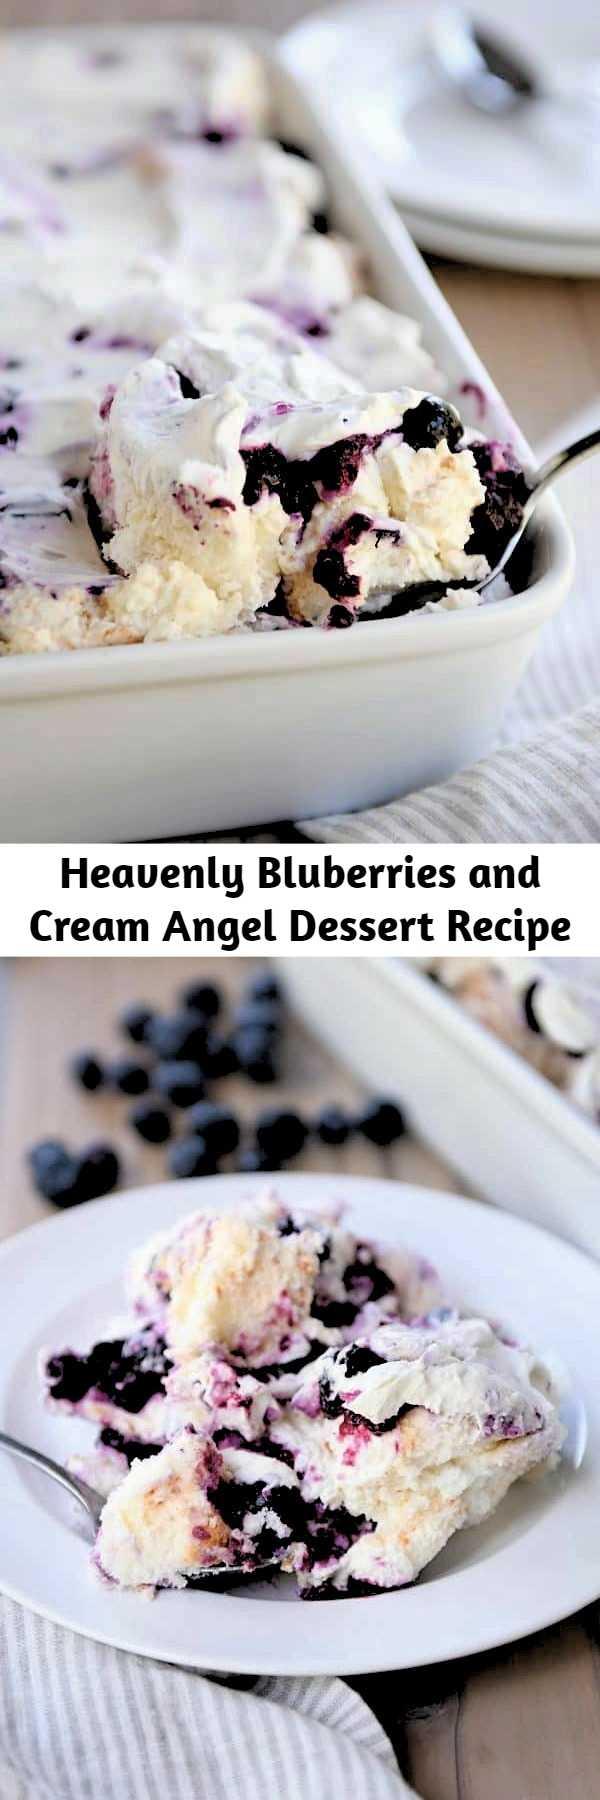 Heavenly Bluberries and Cream Angel Dessert Recipe